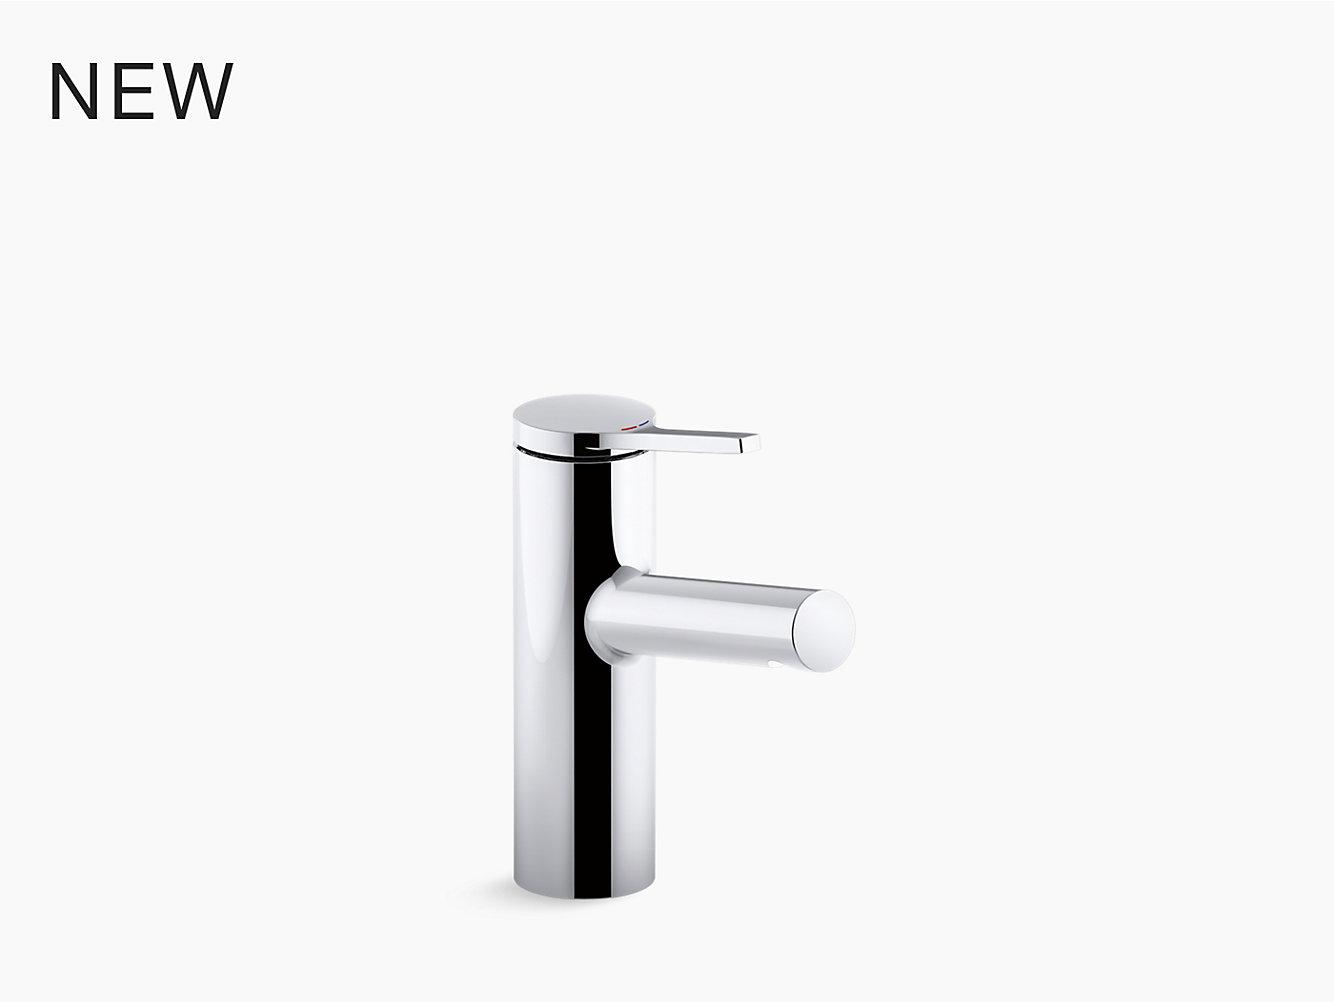 KOHLER | 99491-4 | Elate(R) grifería monomando para lavabo